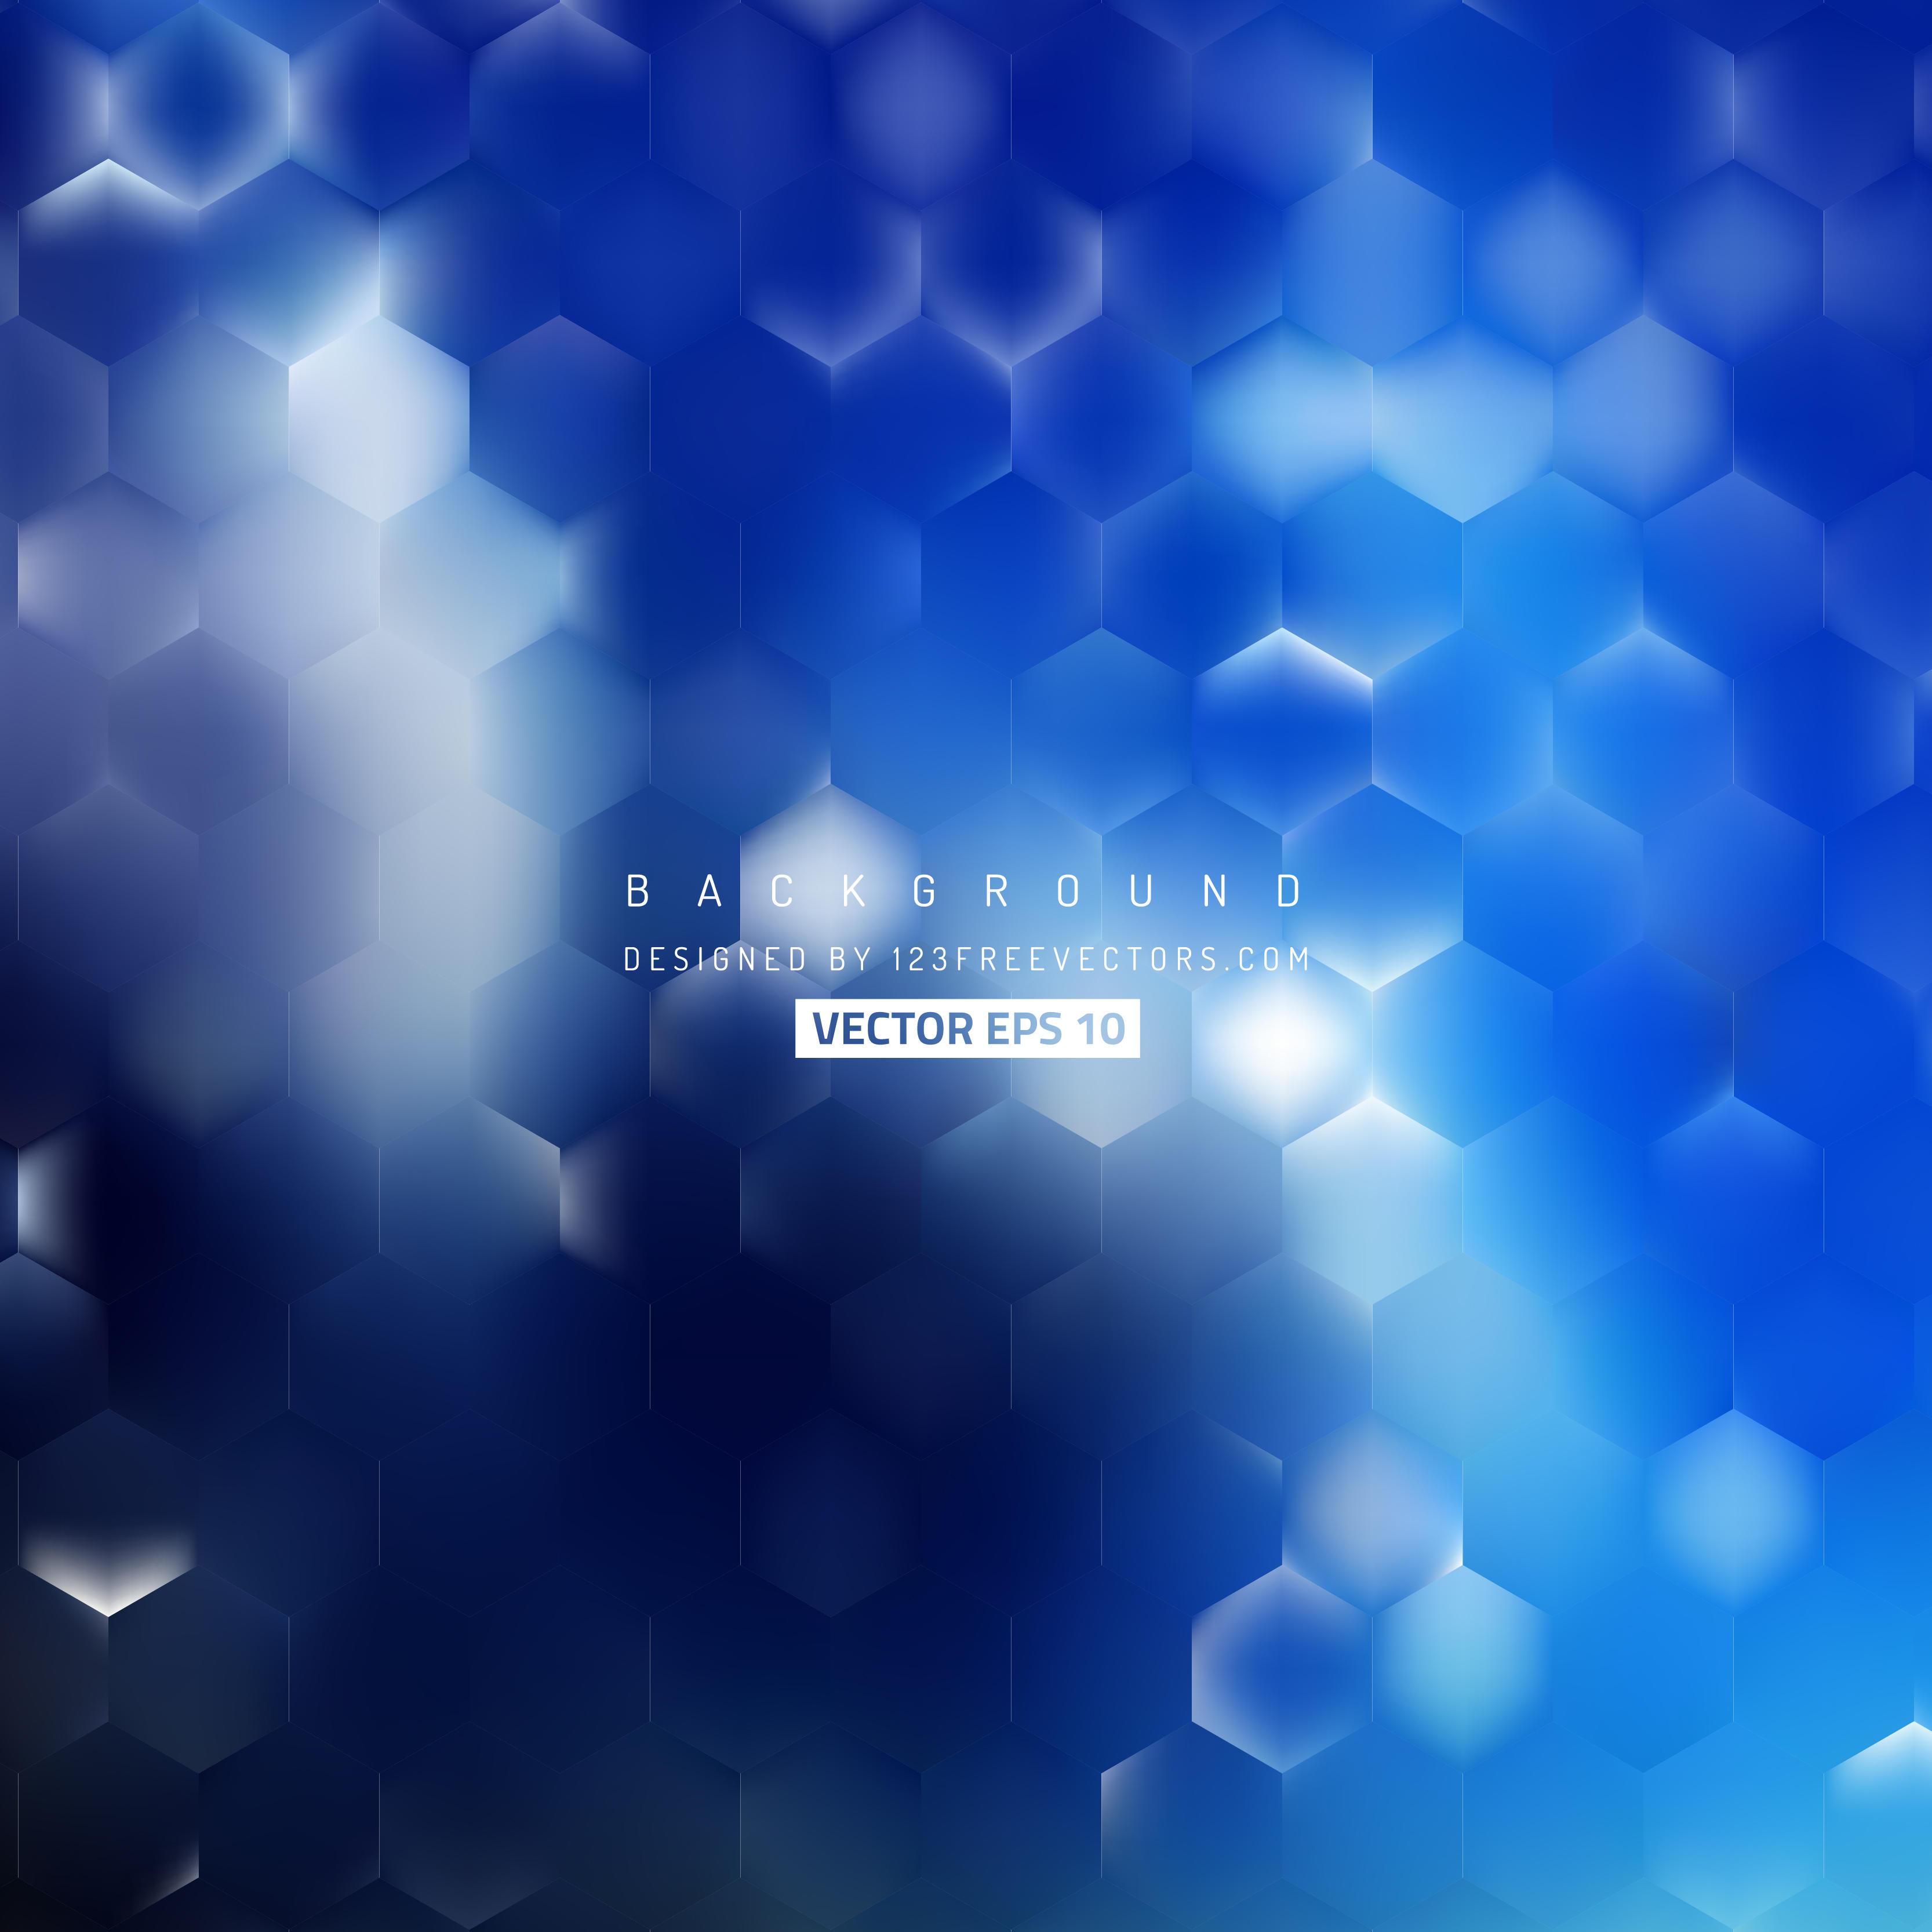 free blue background images for s impremedianet